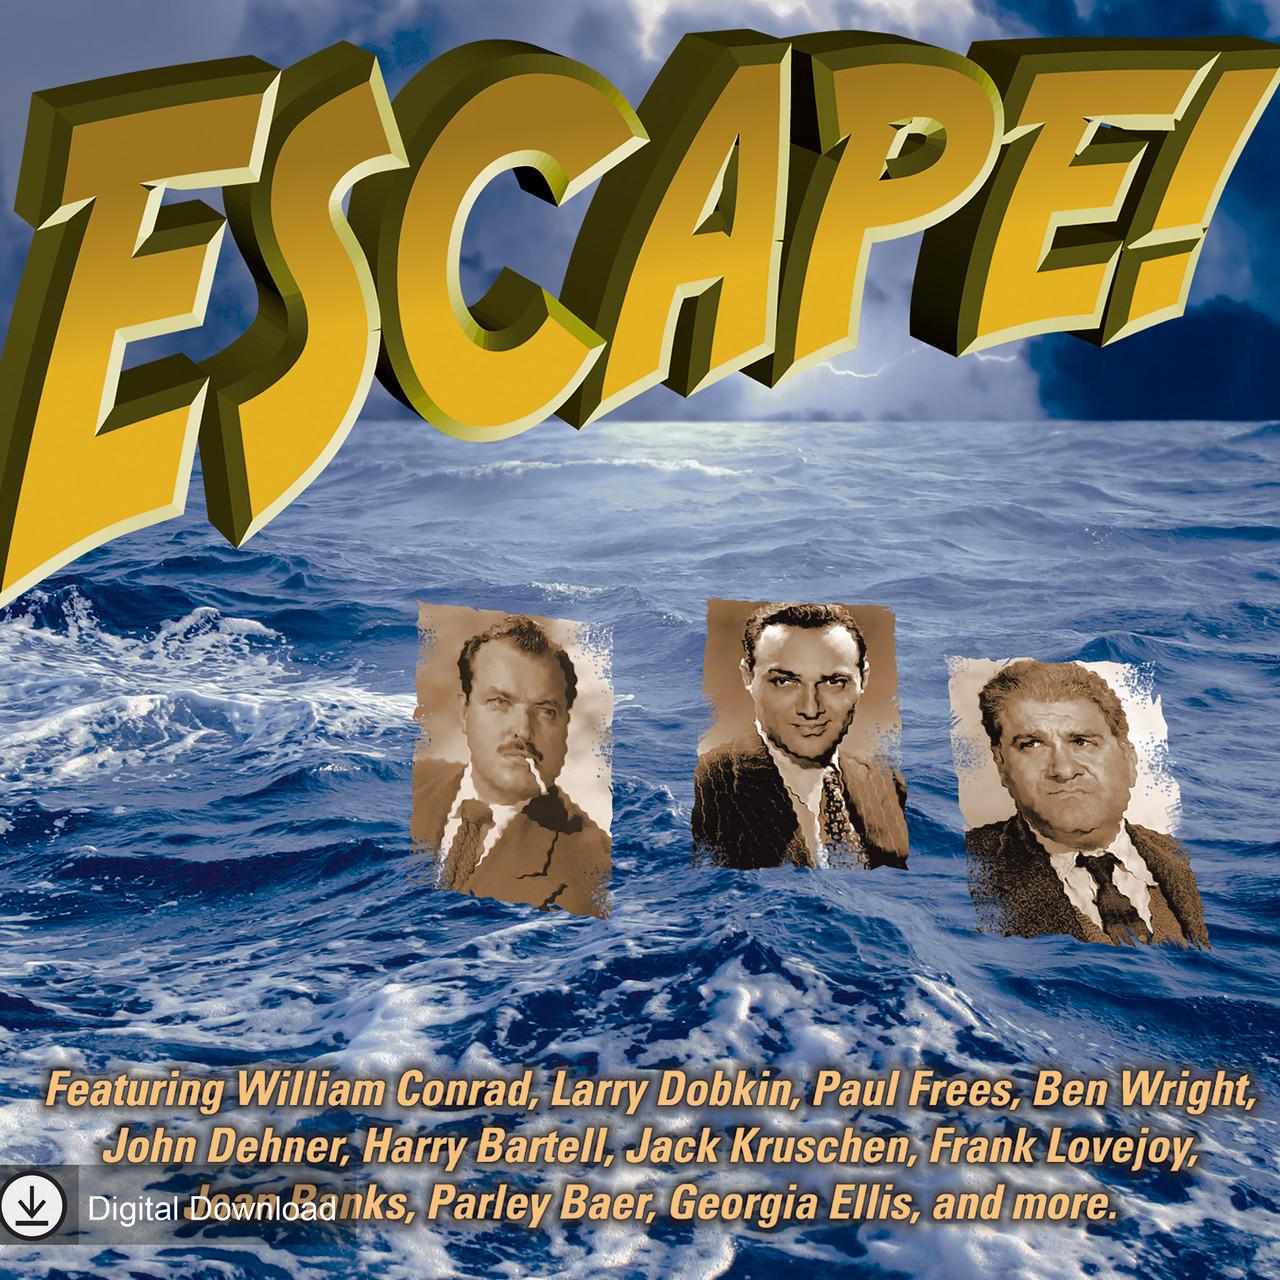 Escape: Journey Into Fear (MP3 Download)